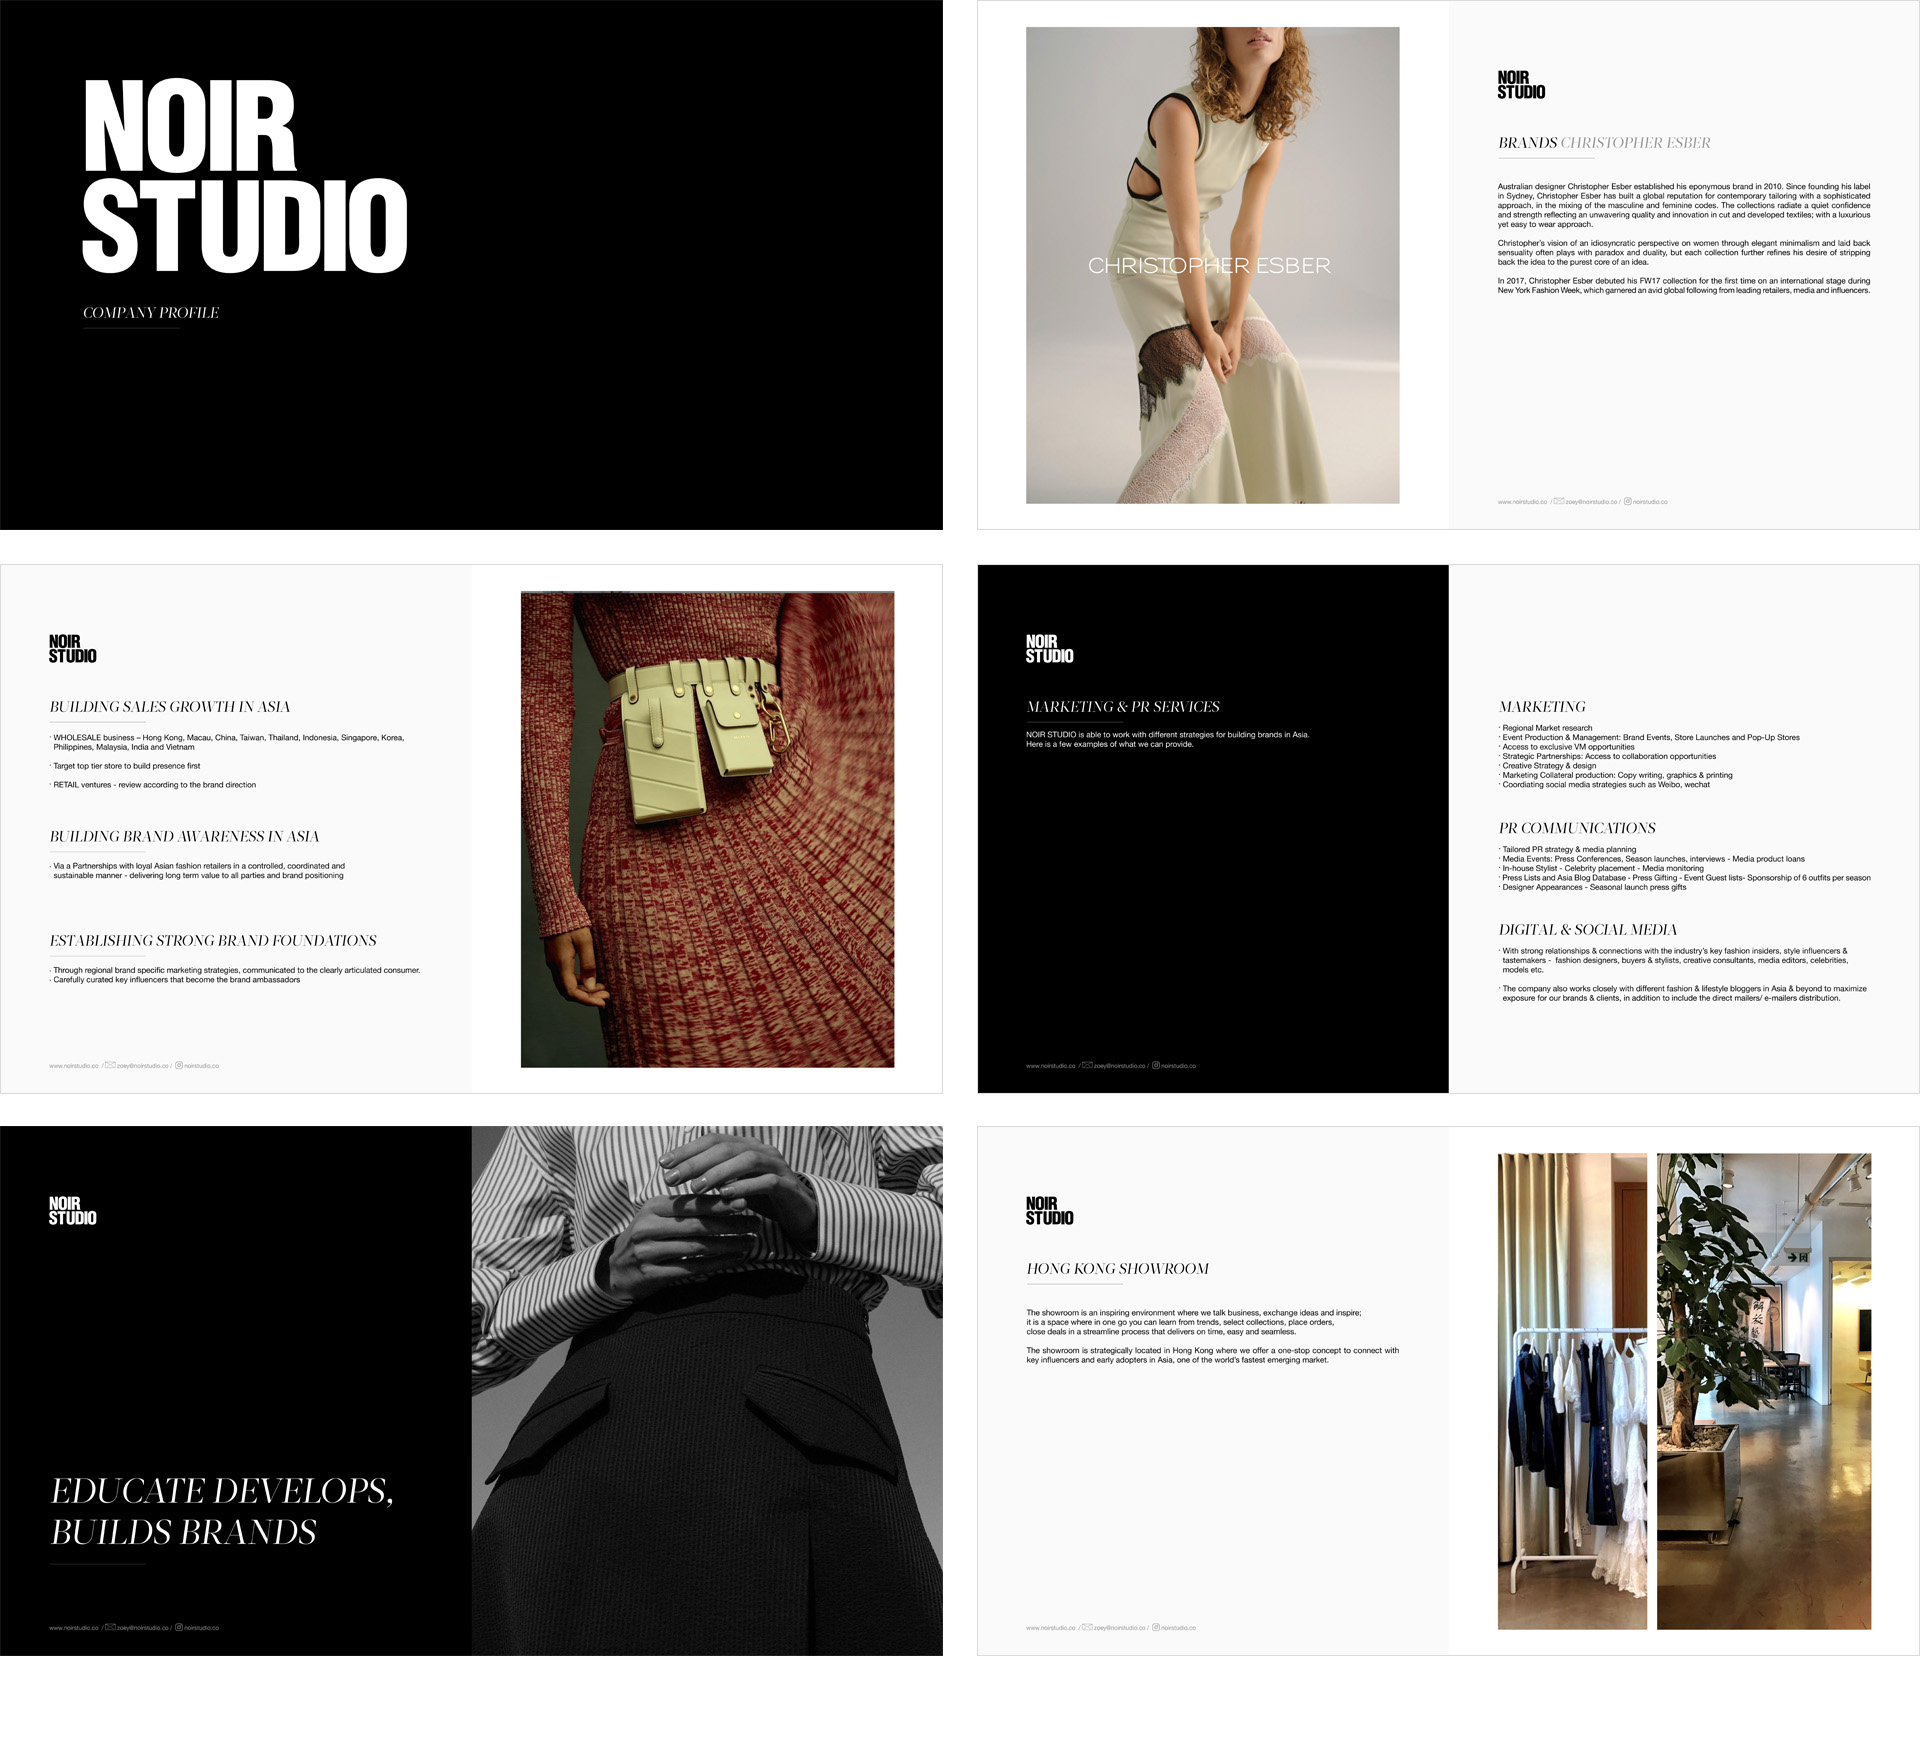 Noir Studio Company profile